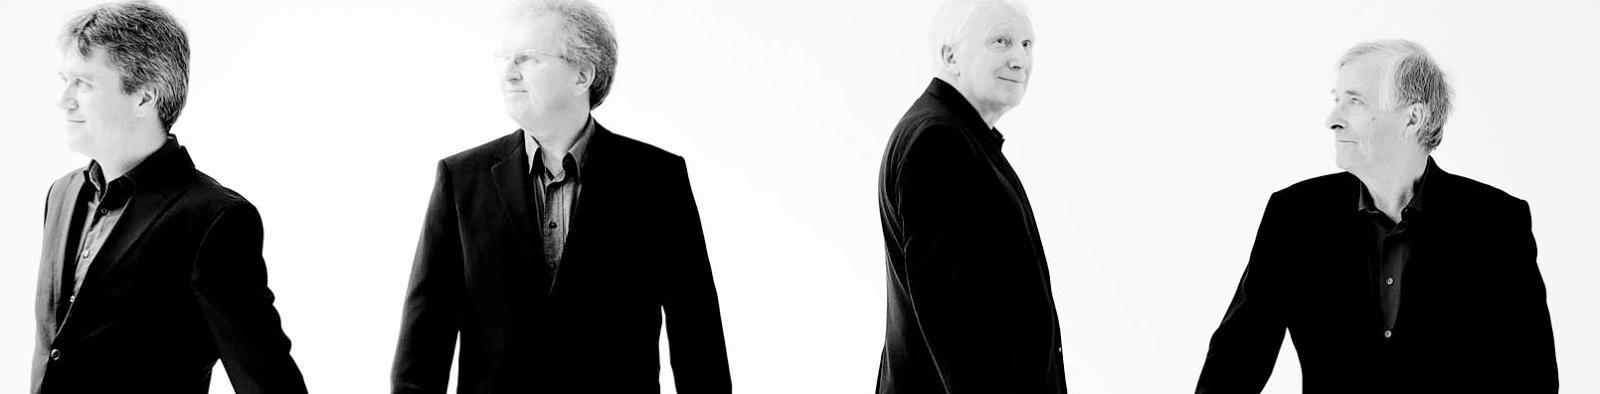 Hilliard Ensemble - photo Marco Borgreve